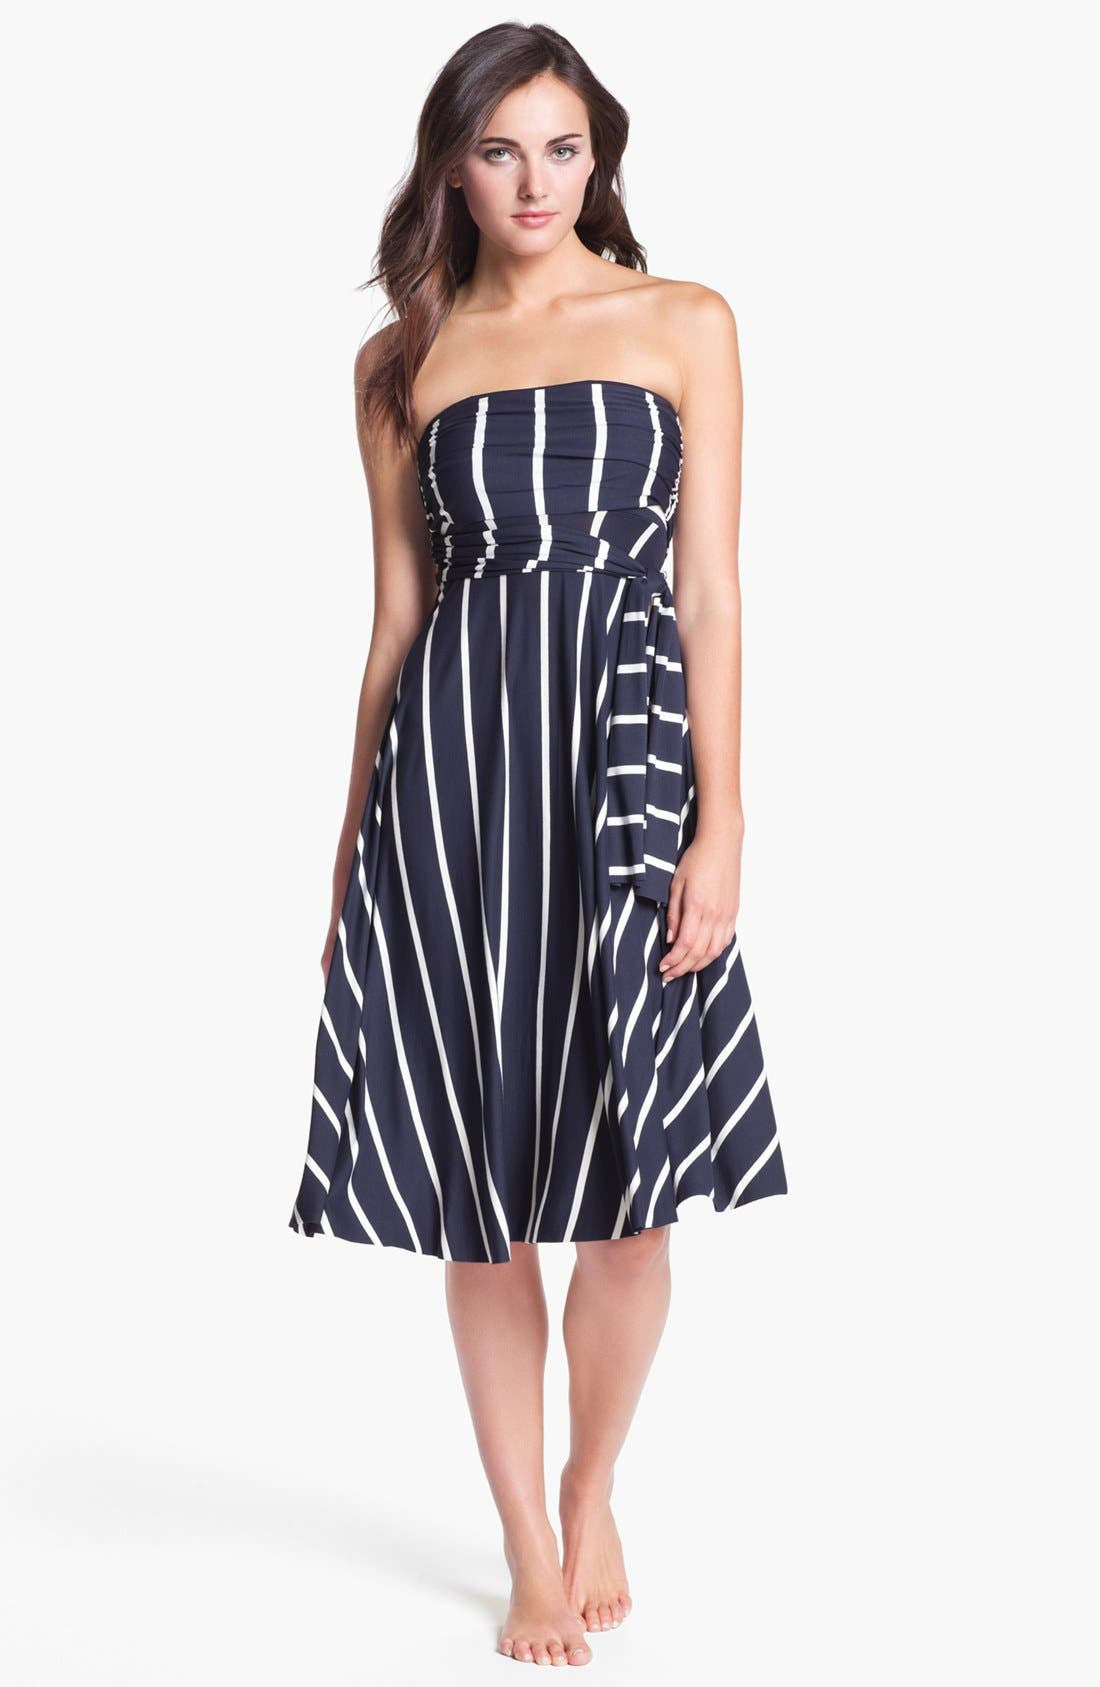 Alternate Image 1 Selected - Elan Stripe Convertible Cover-Up Dress